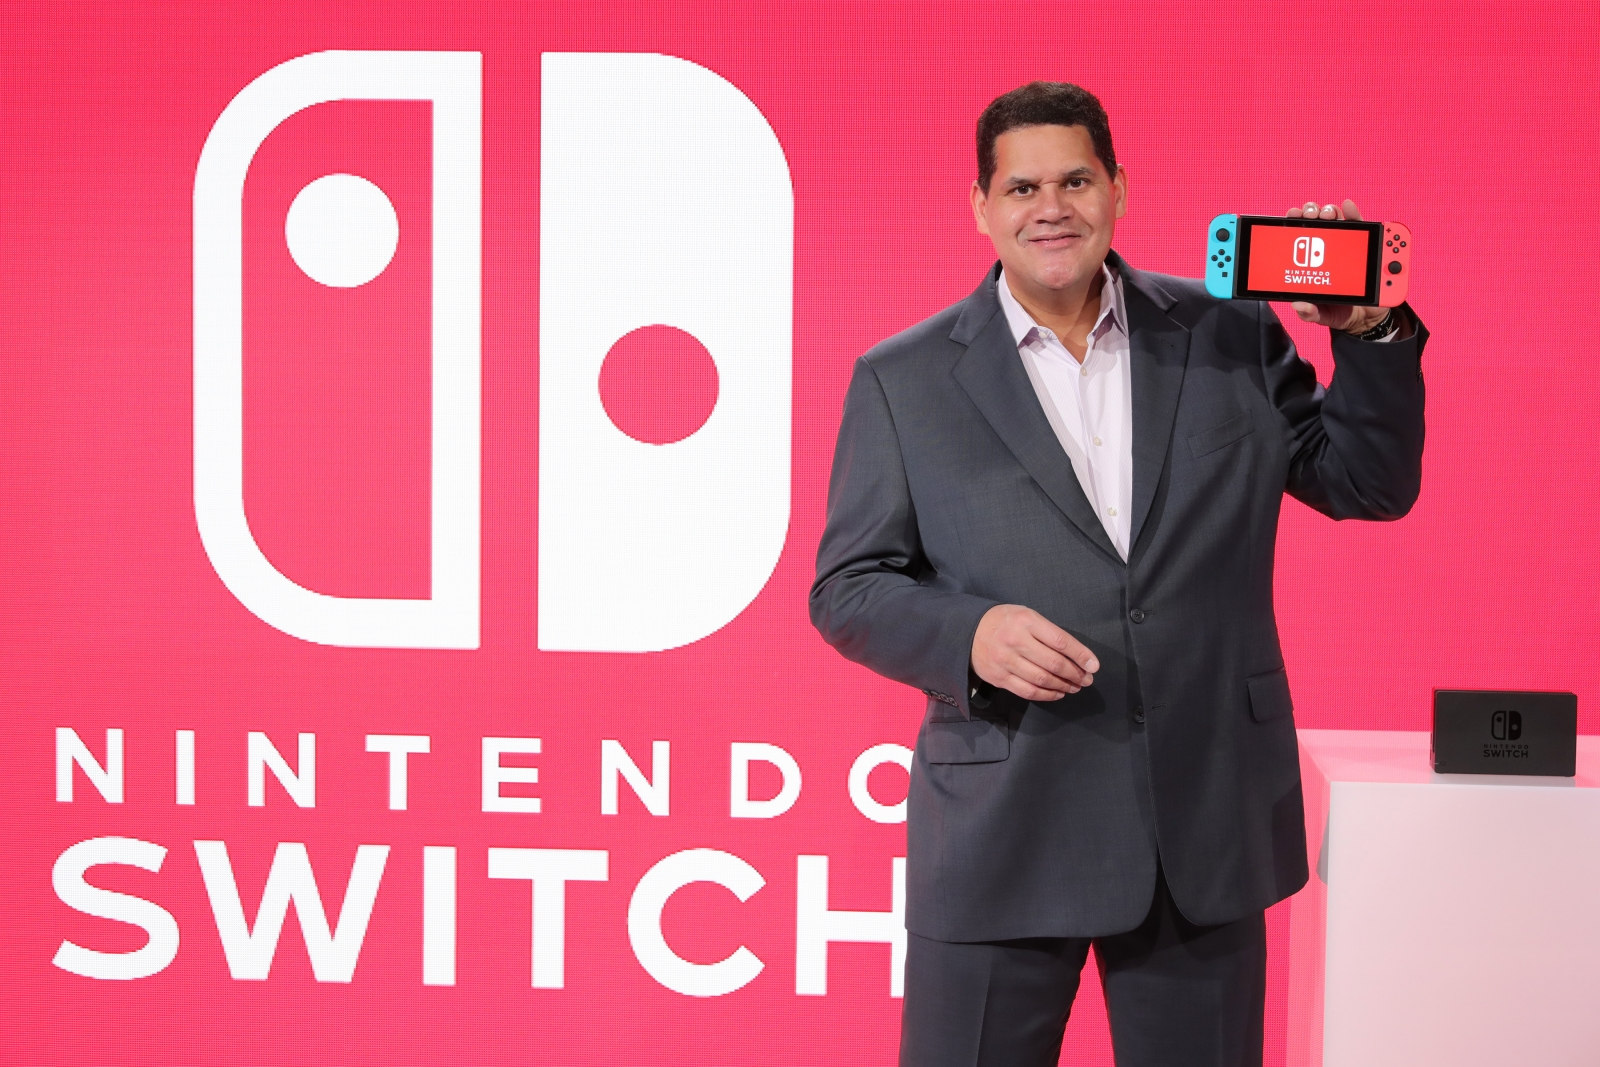 Nintendo Switch Reggie Fils-Aime